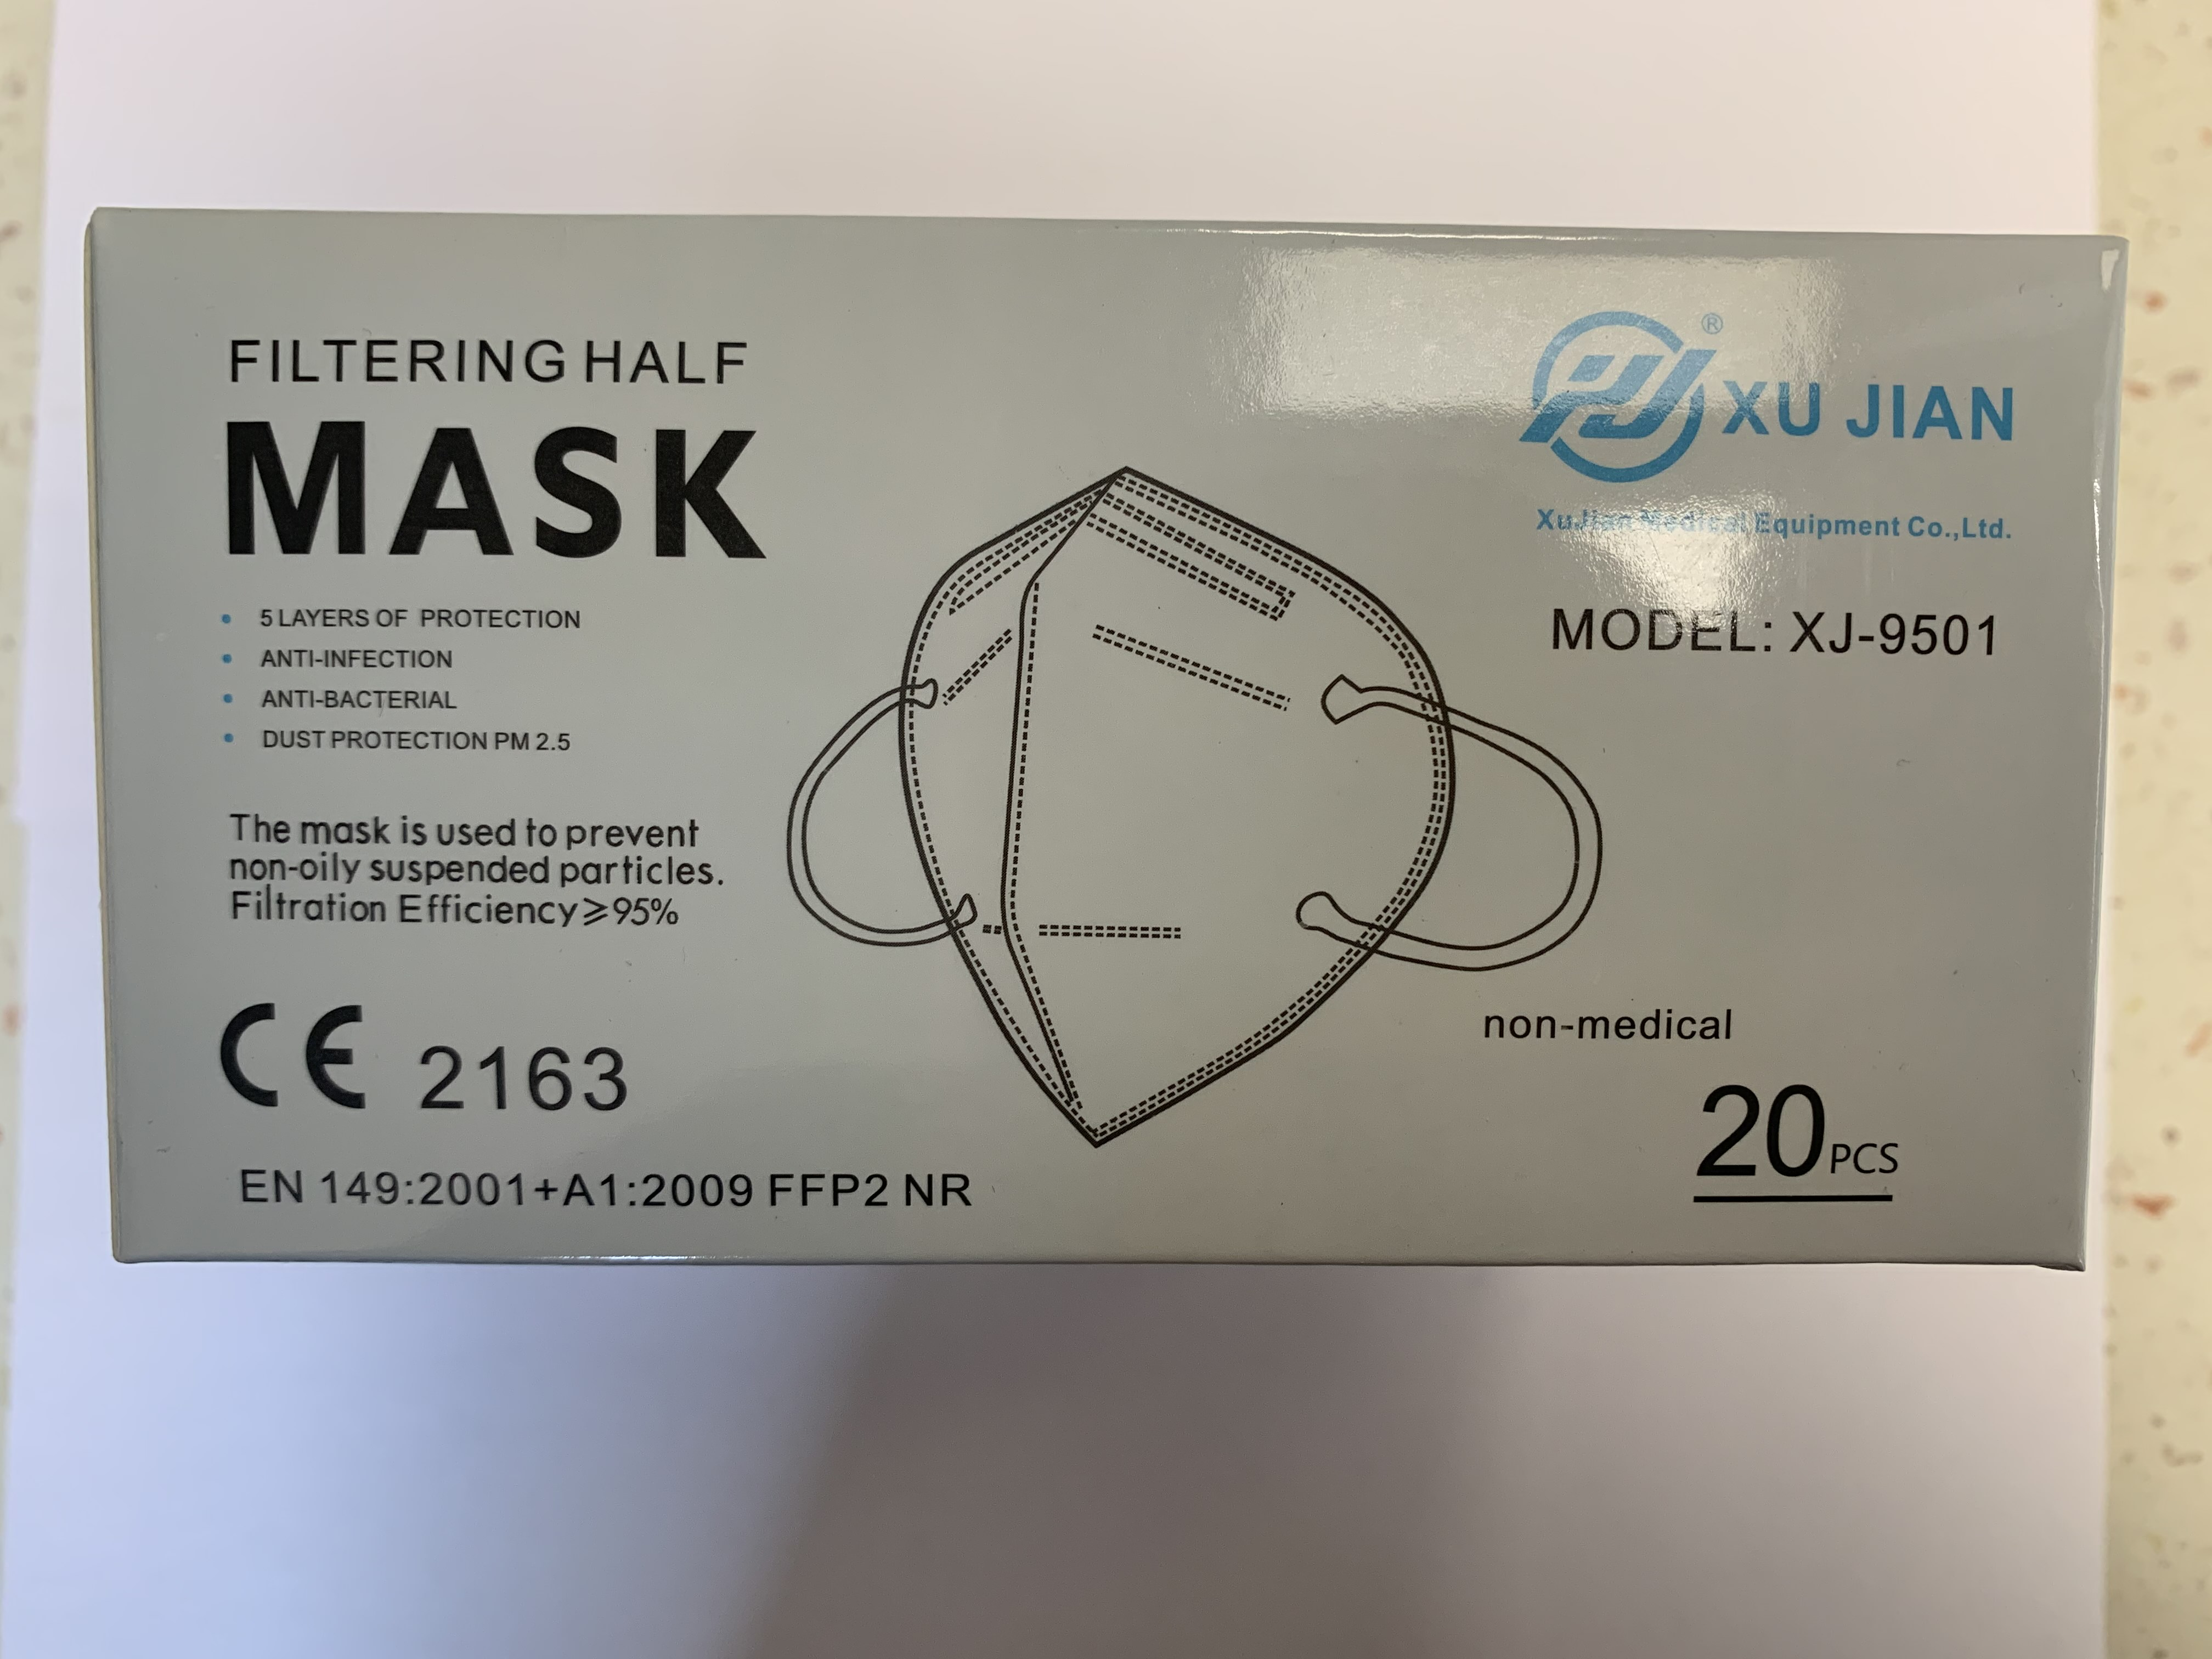 FILTERING HALF MASK XJ-9501 CE 2163 1ks FFP2